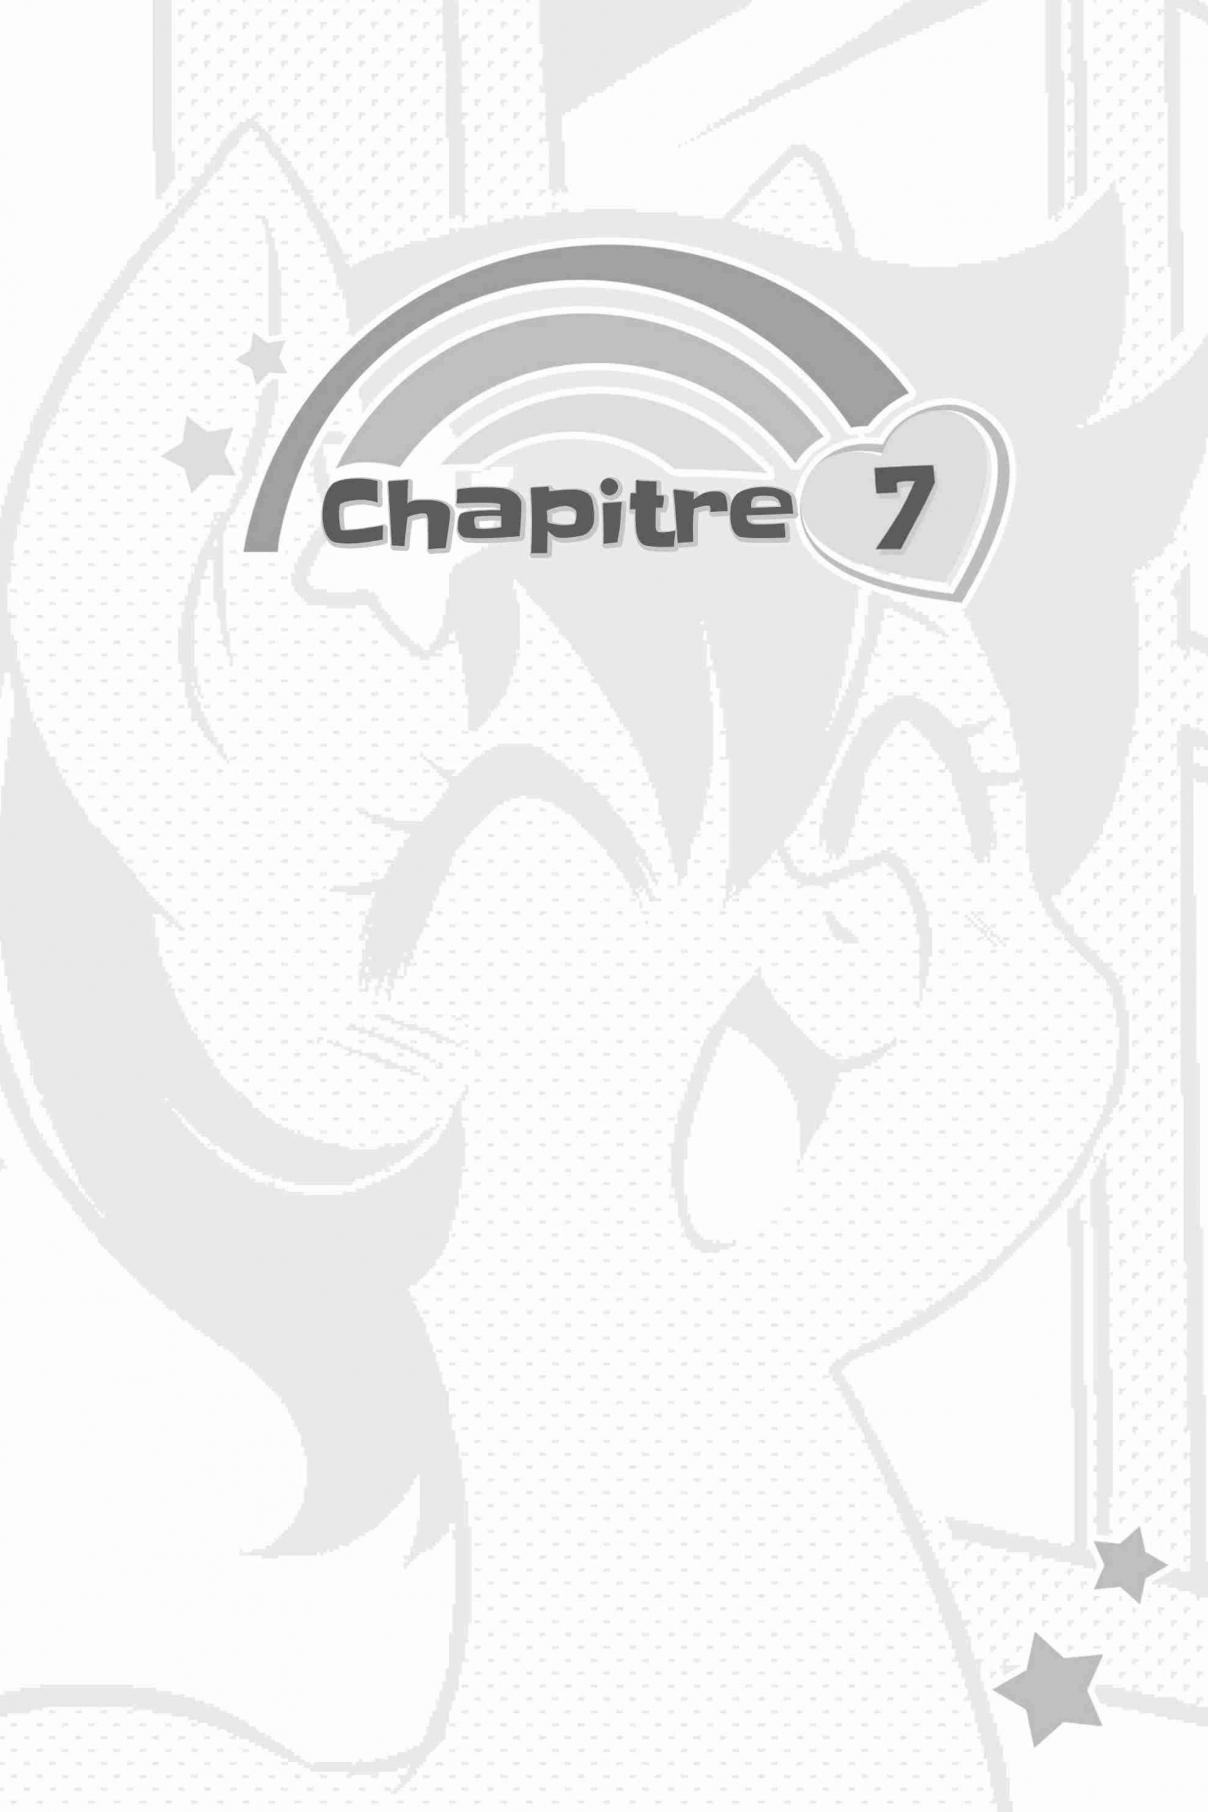 https://nine.mangadogs.com/fr_manga/pic2/53/7477/449321/6d55a62e8f25f61dee04192481e8fab6.jpg Page 1